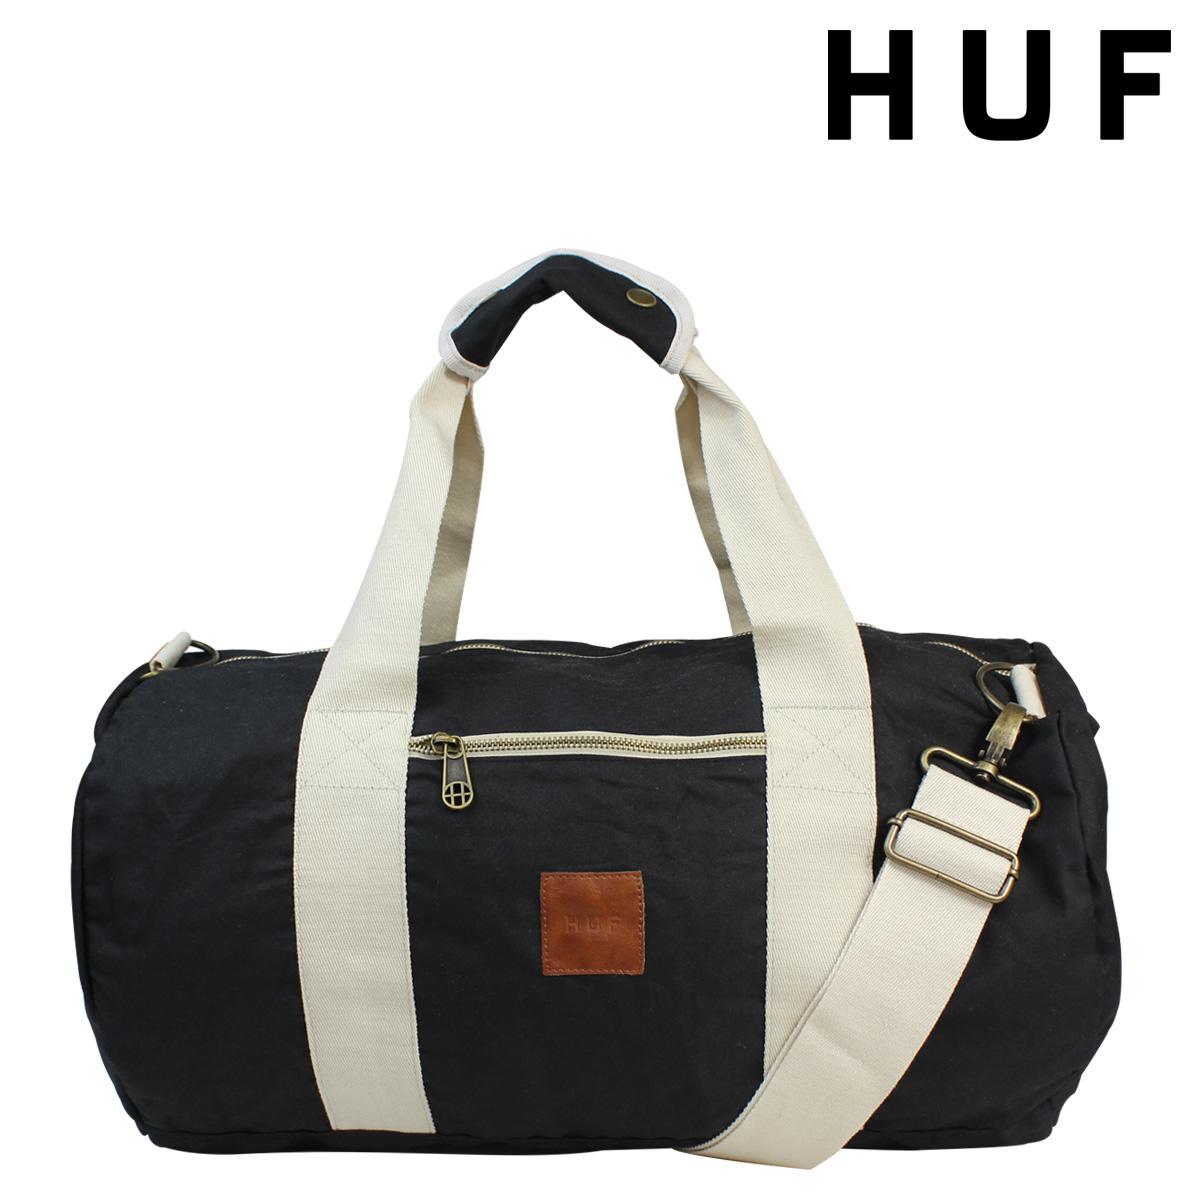 Huf Weekend Duffle Bag Boston Style Ac53007